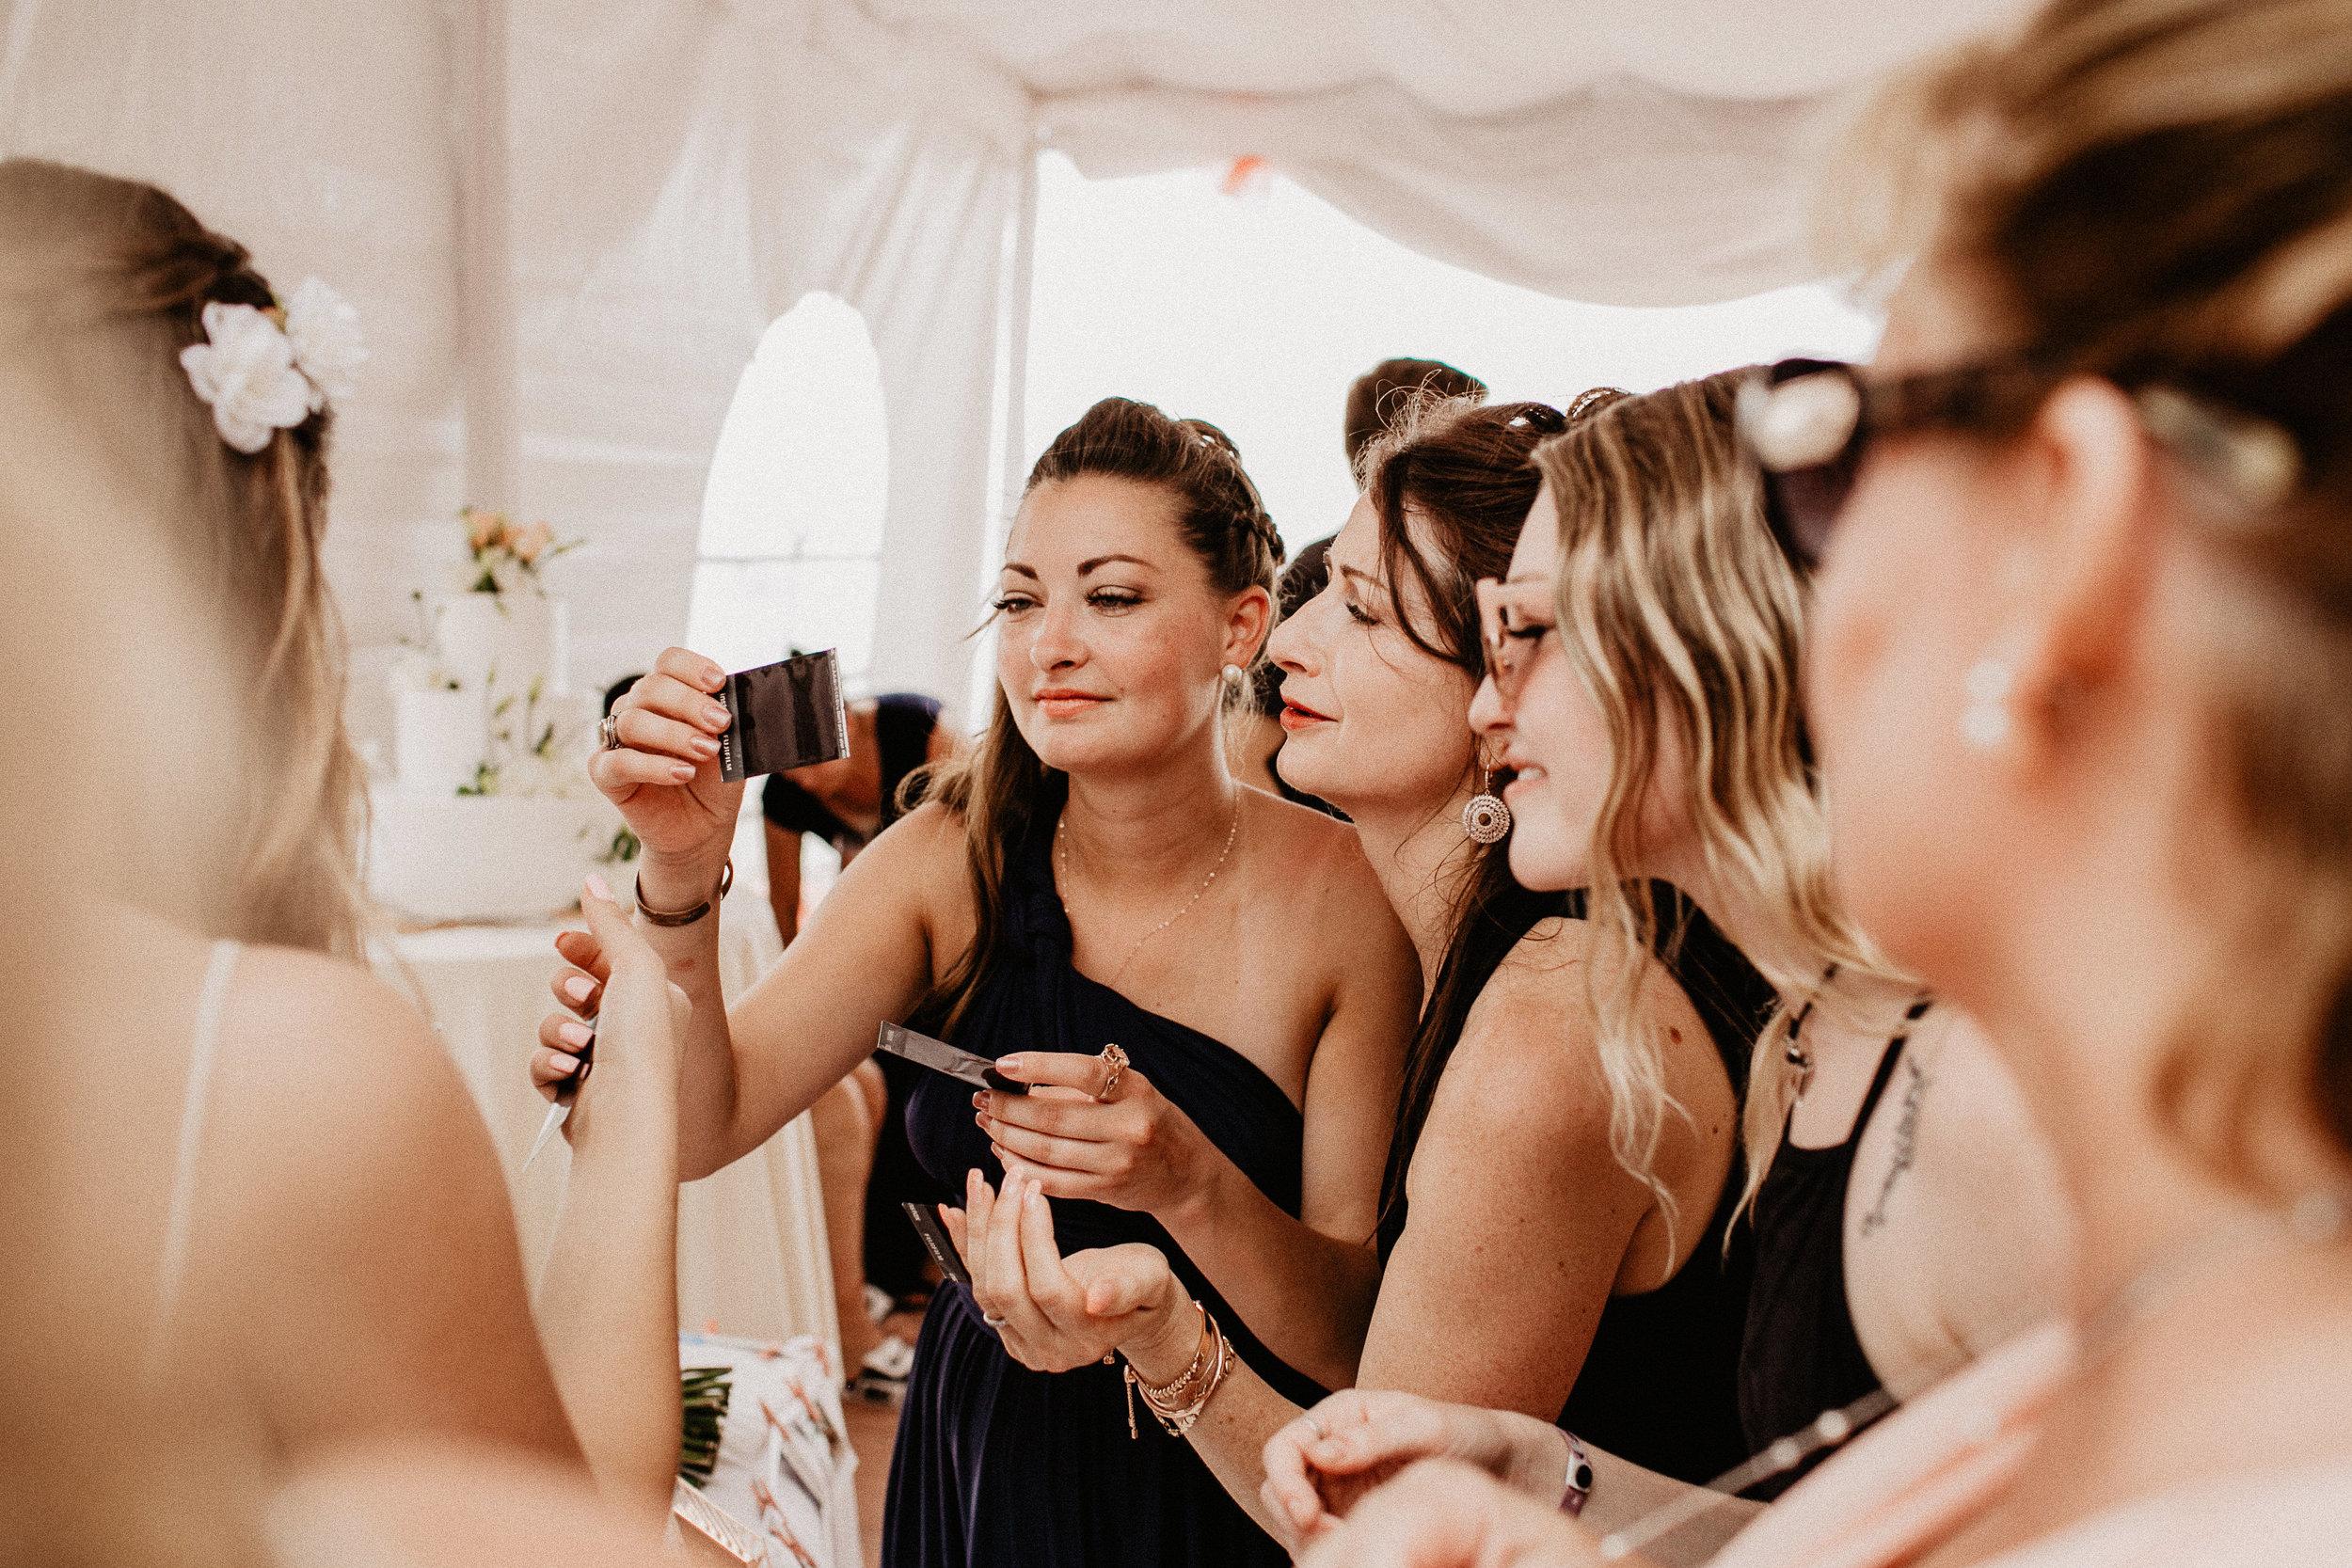 alfonso_flores_destination_wedding_photography_puerto_vallarta_hotel_barcelo_vallarta_cuttler_amela-551.JPG